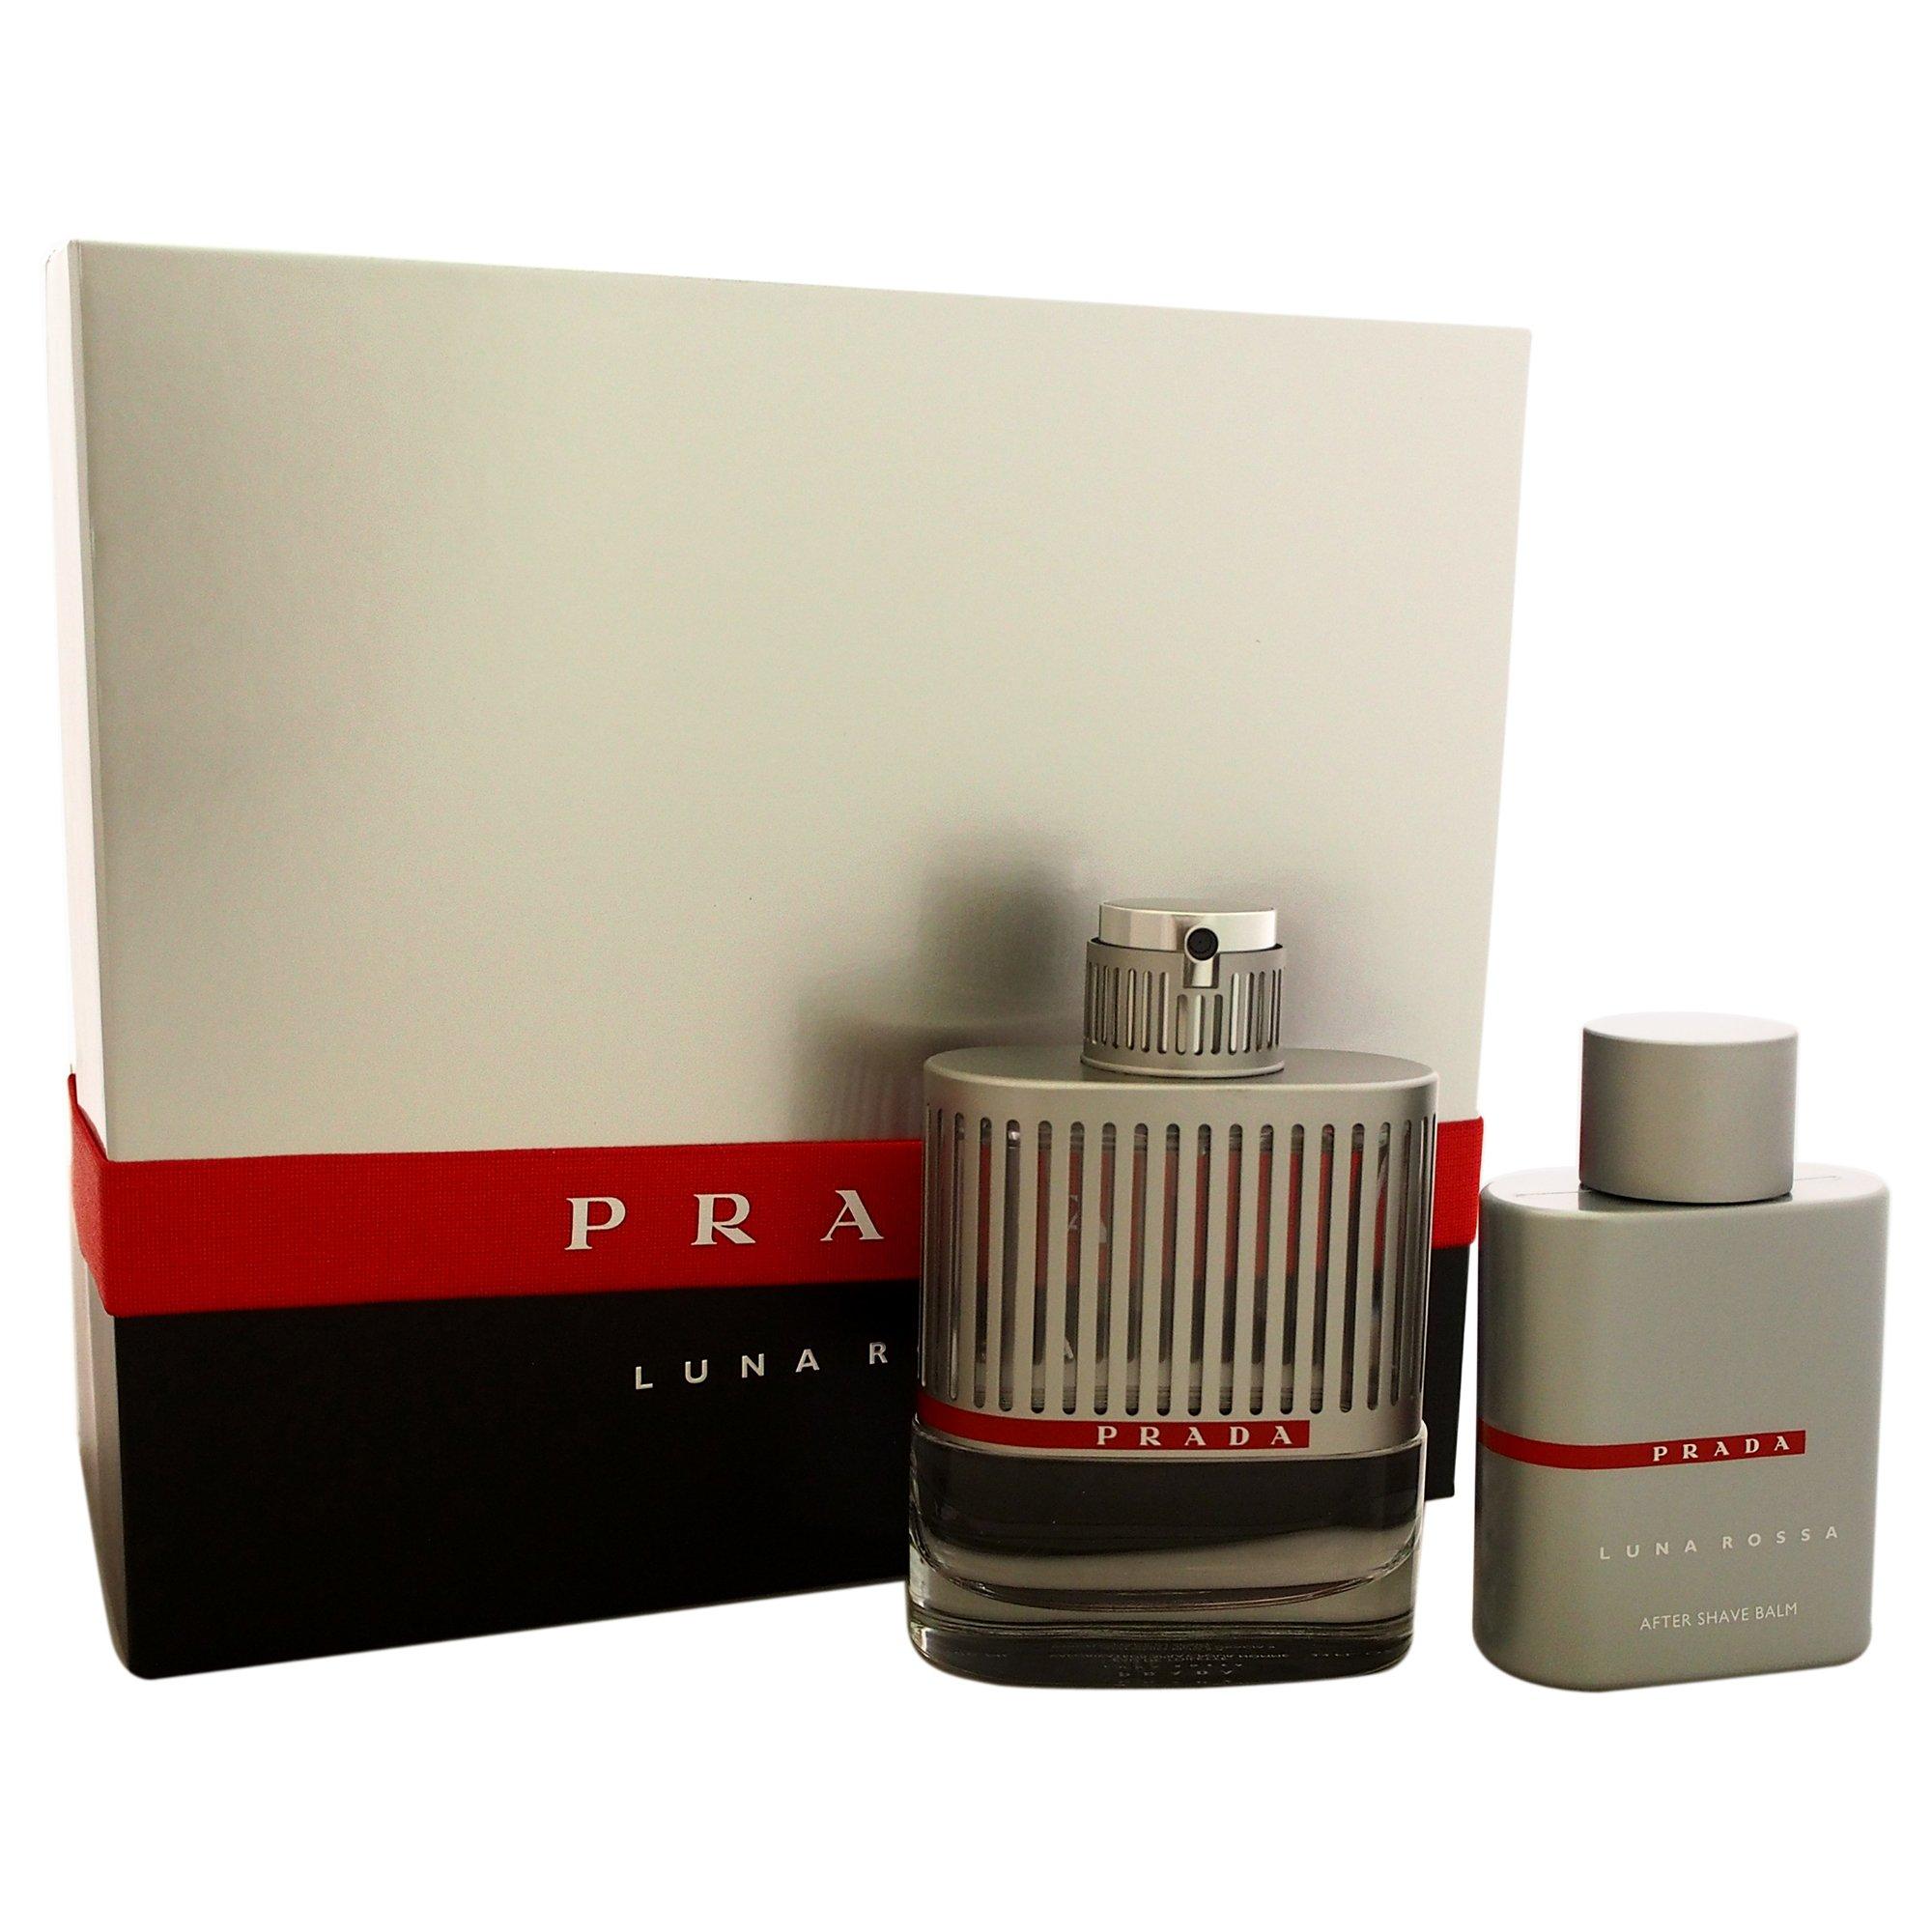 Prada Luna Rossa Fragrance Sets for Men